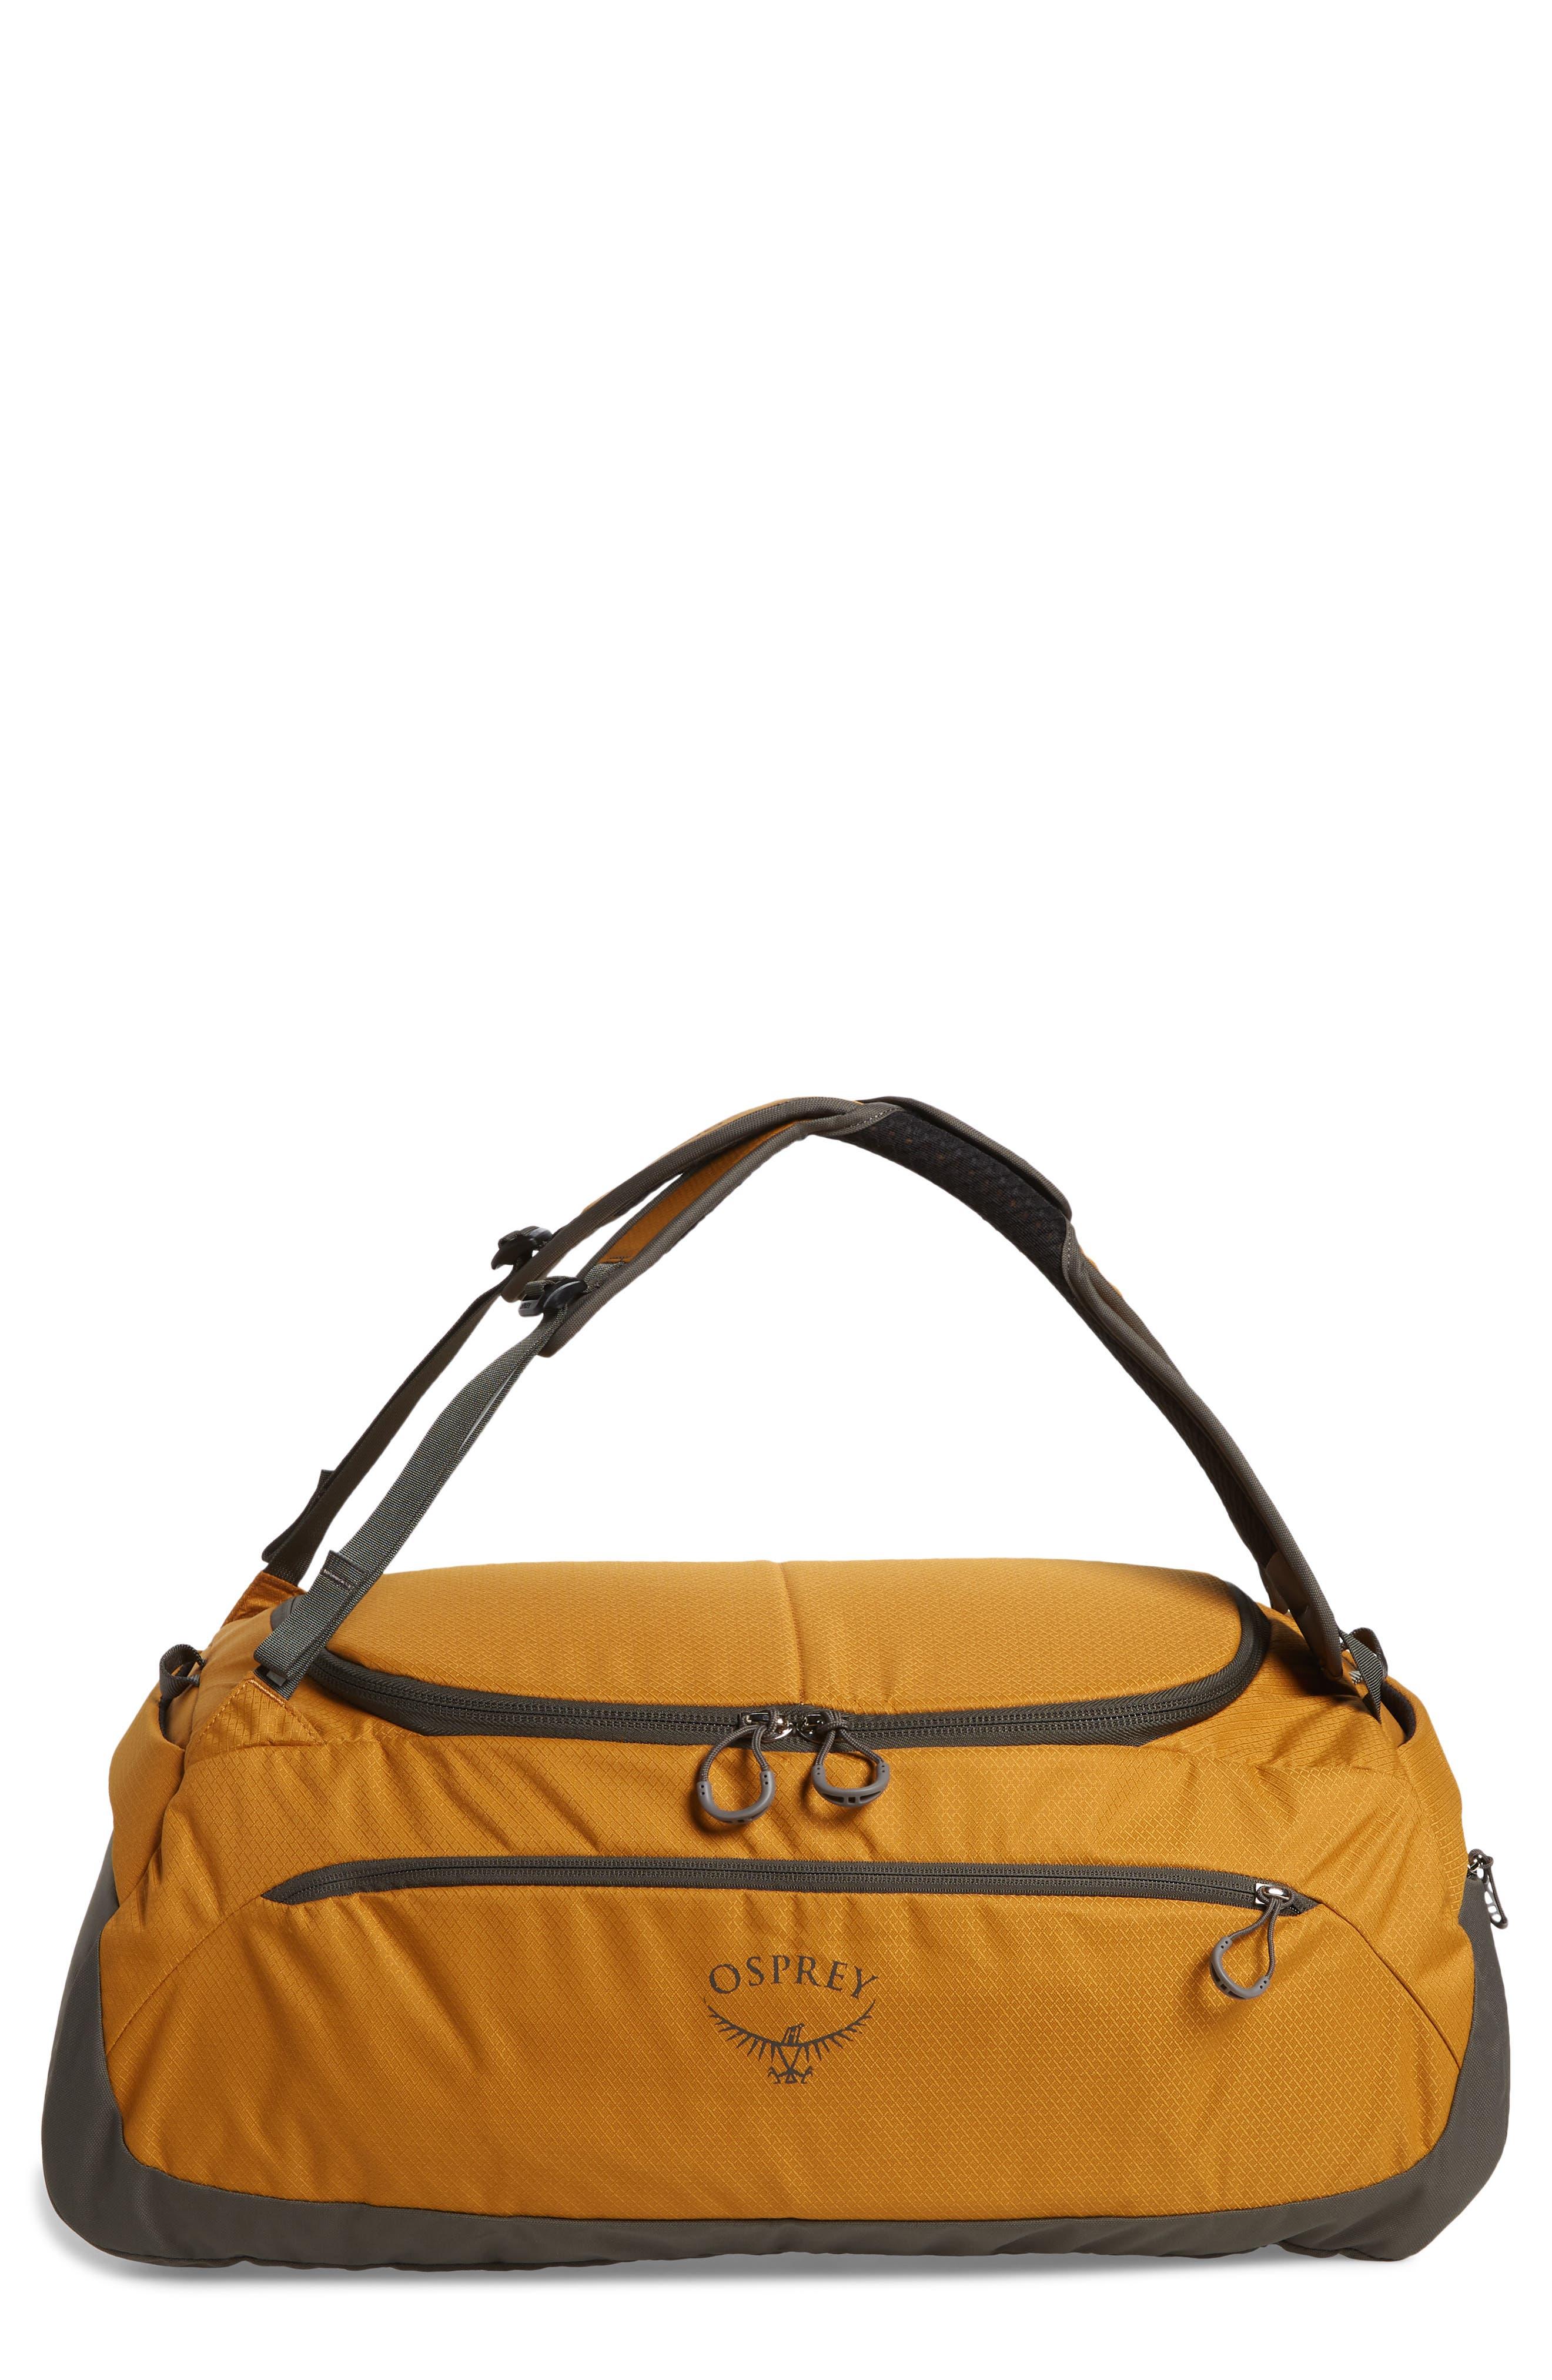 Daylite 45L Duffle Bag